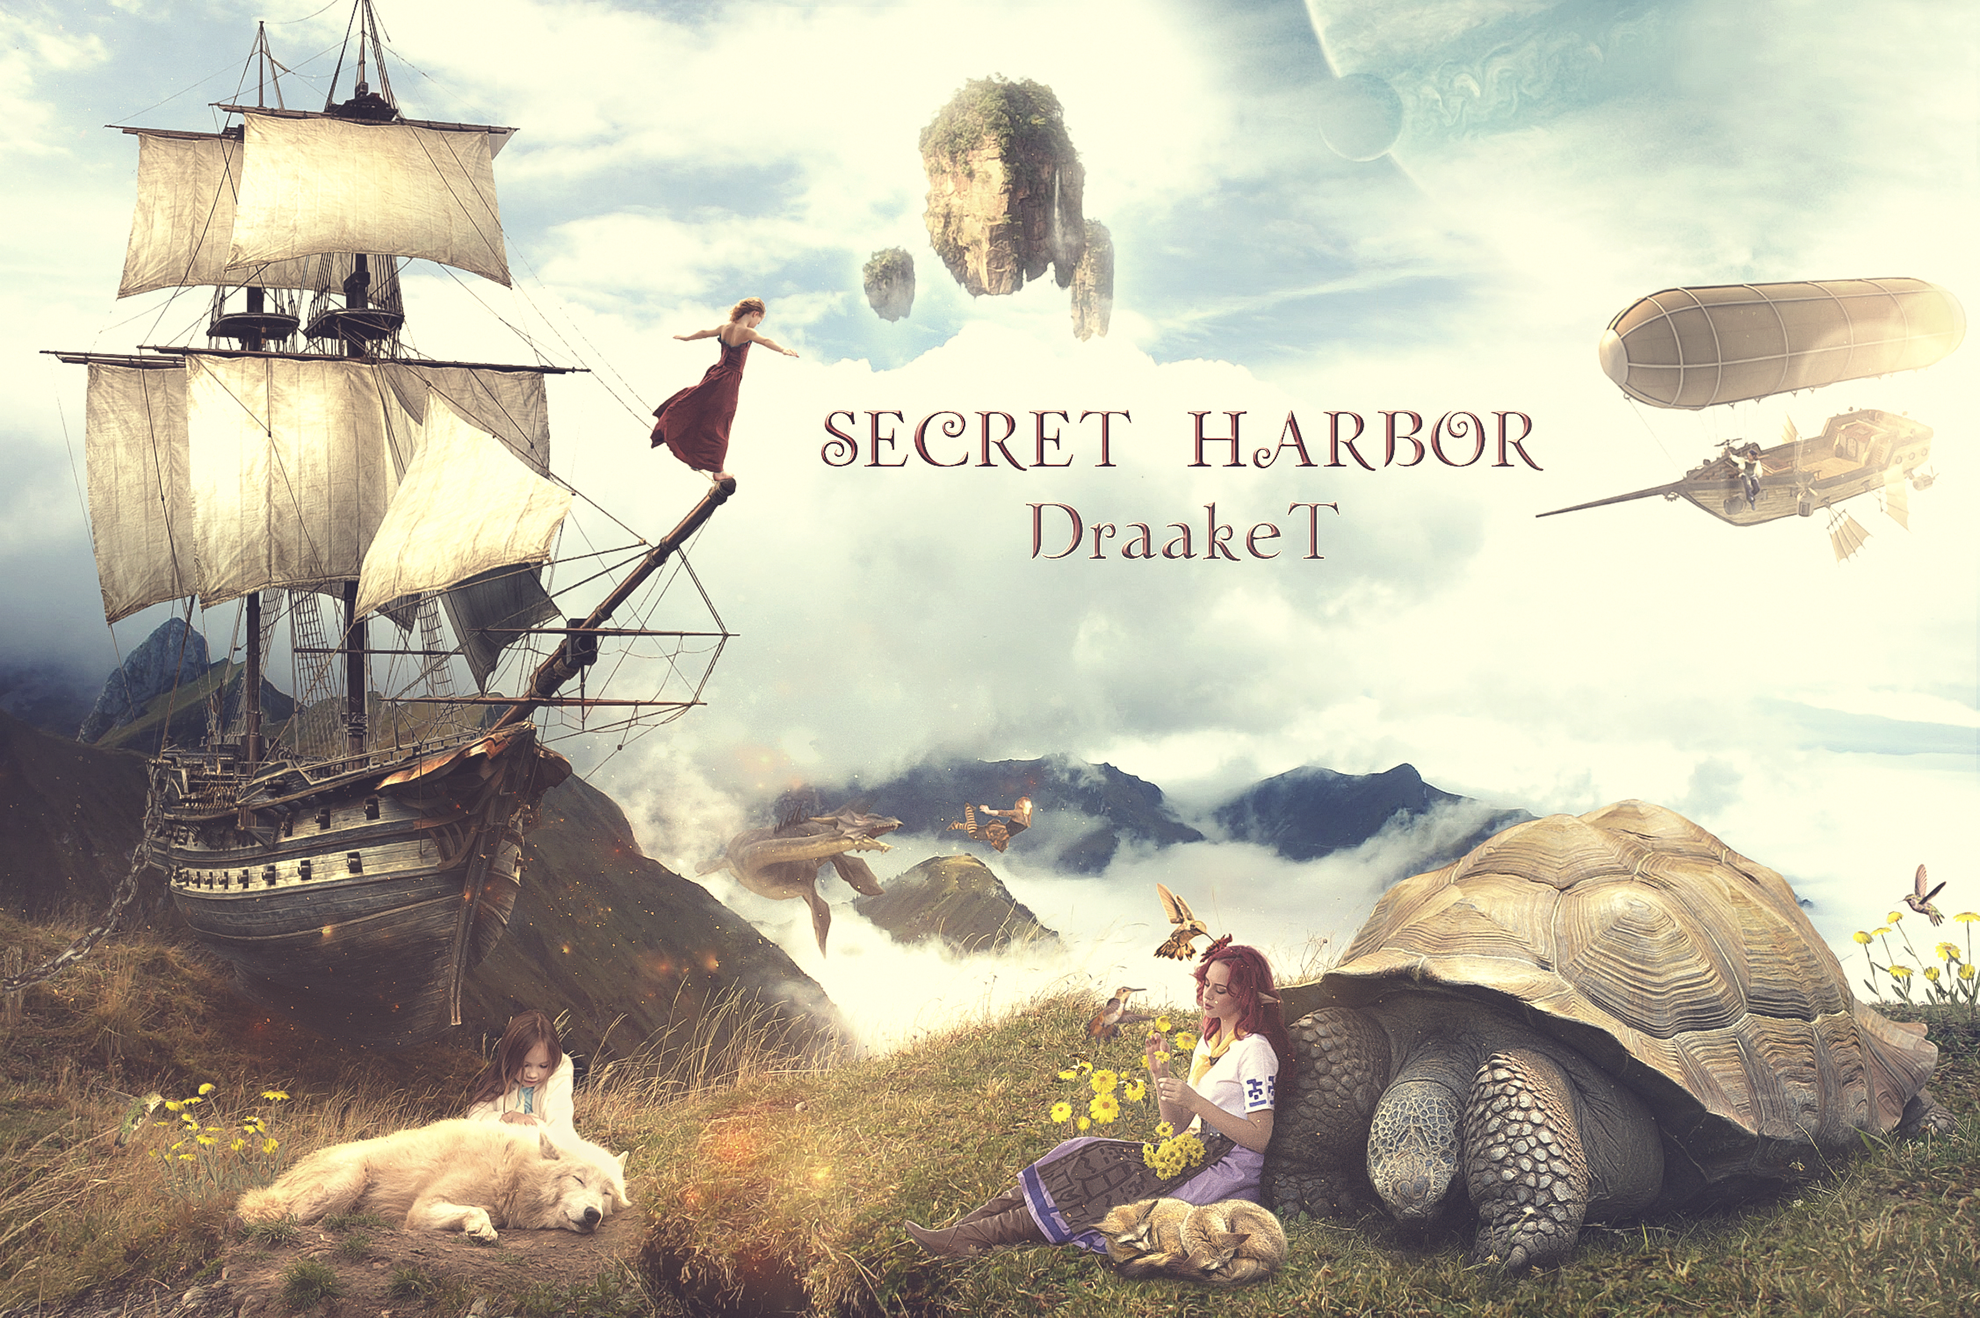 Secret Harbor by DraakeT 1980x1318 by DraakeT